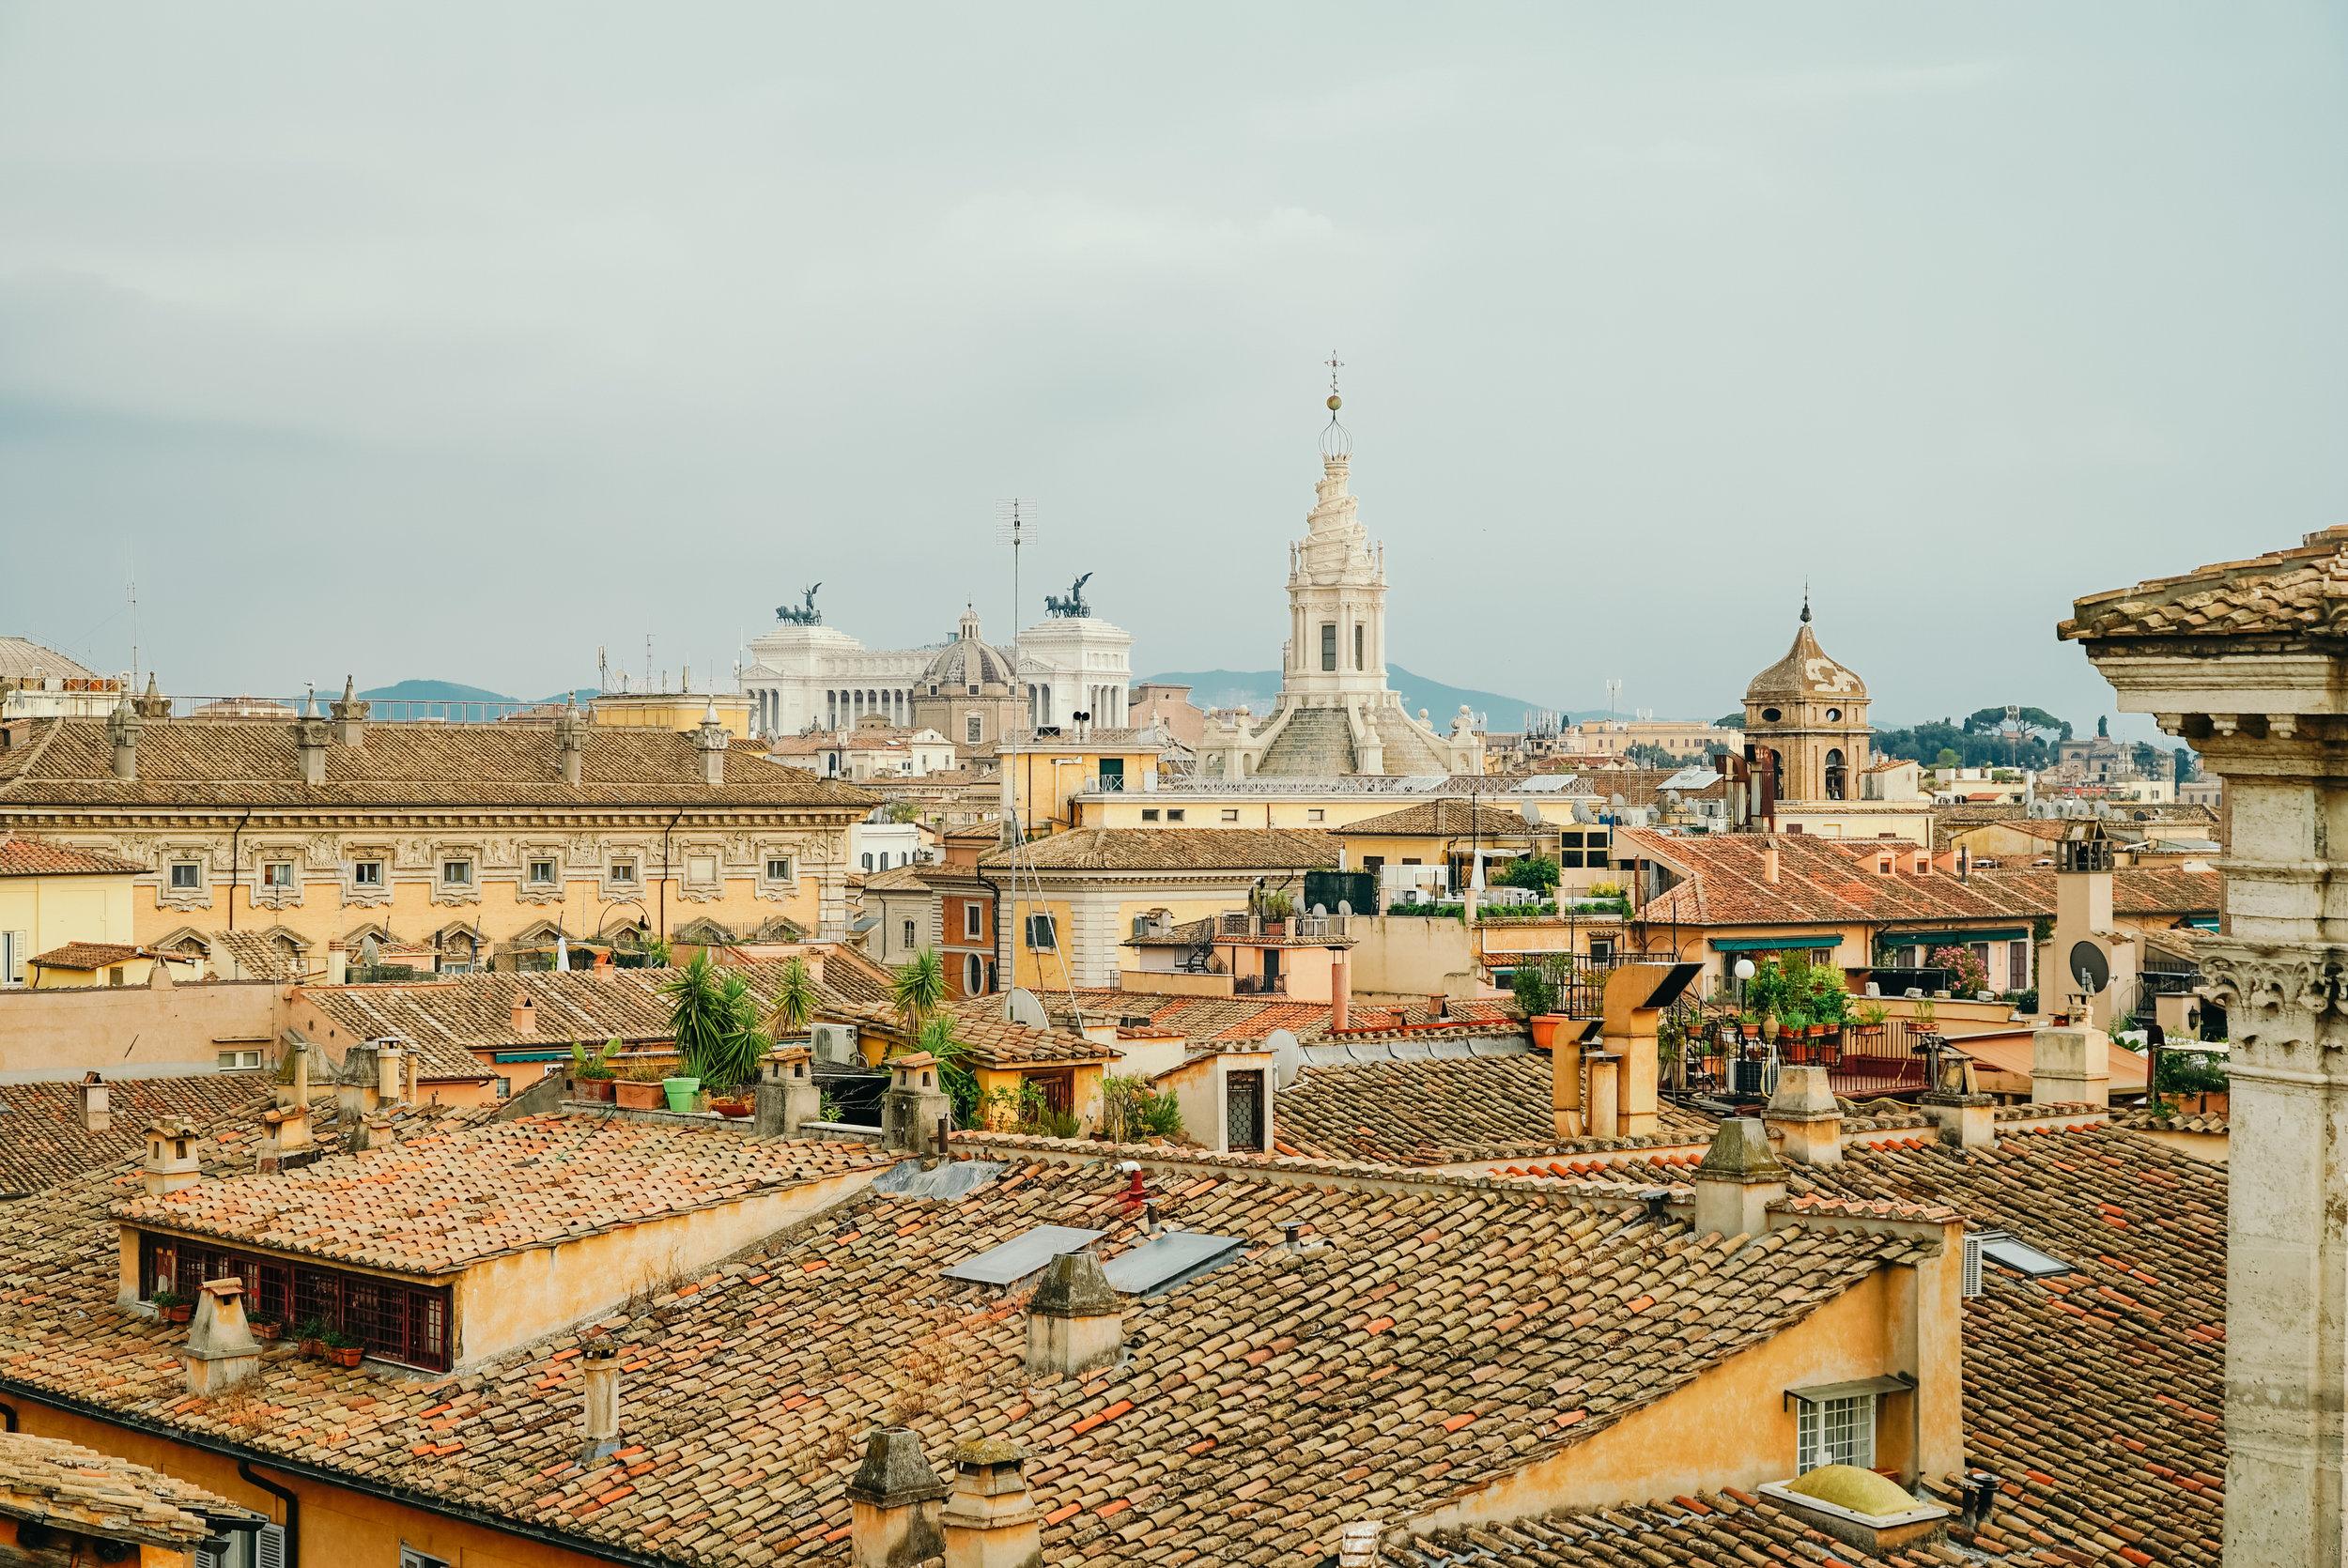 View from Terraza Borromini